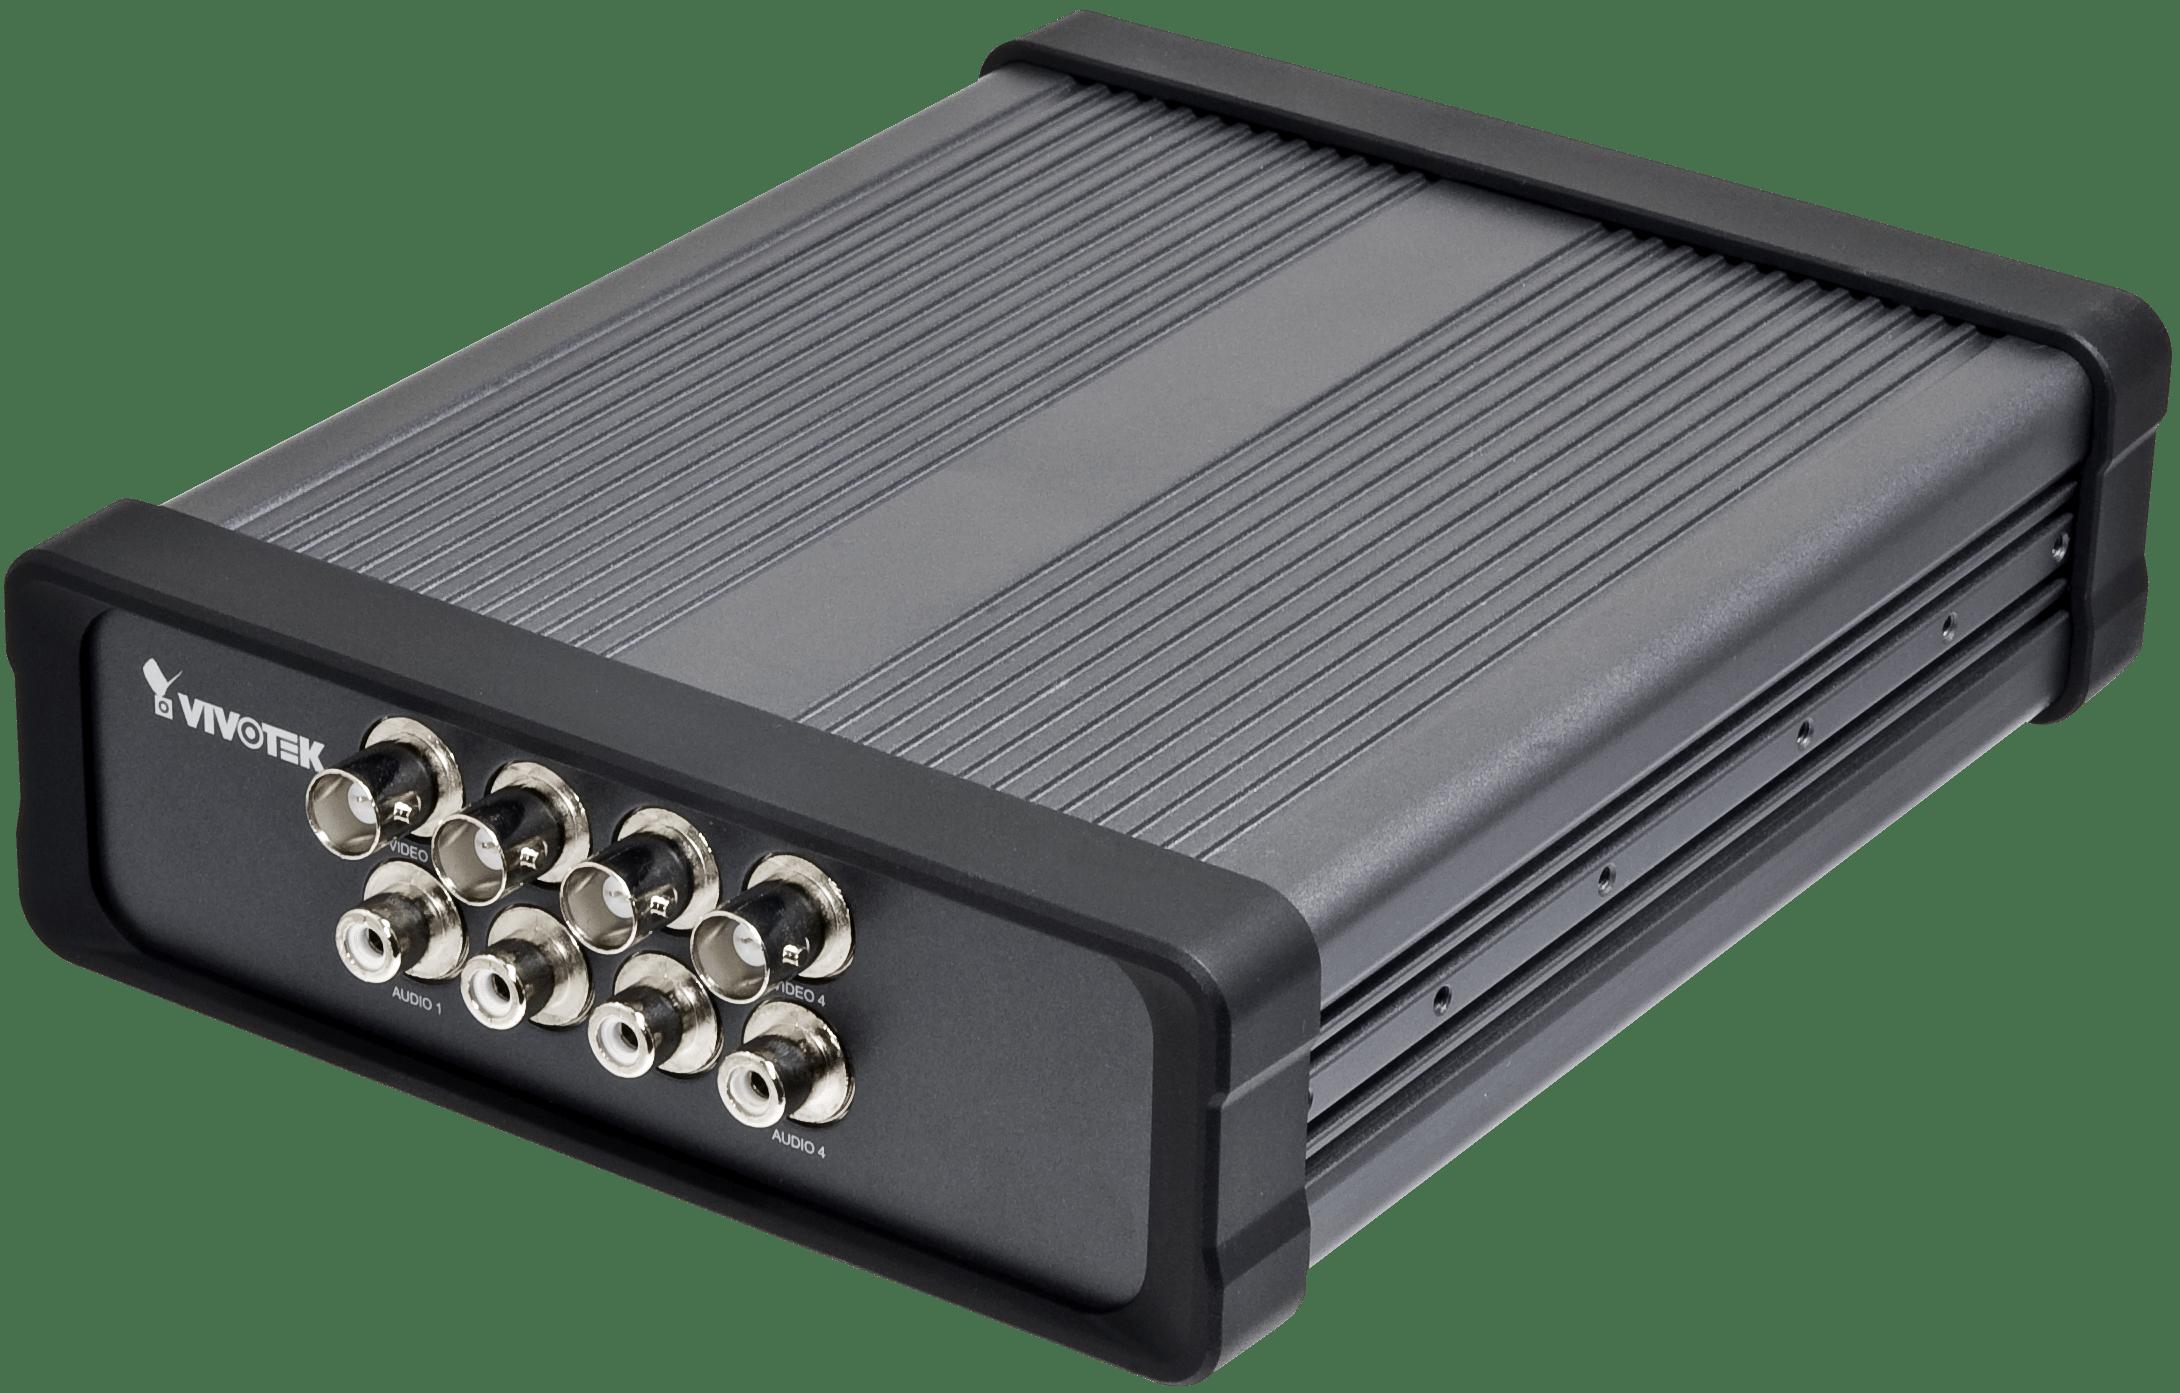 Vs8401 Vivotek Video Server H 264 Sd Sdhc Card